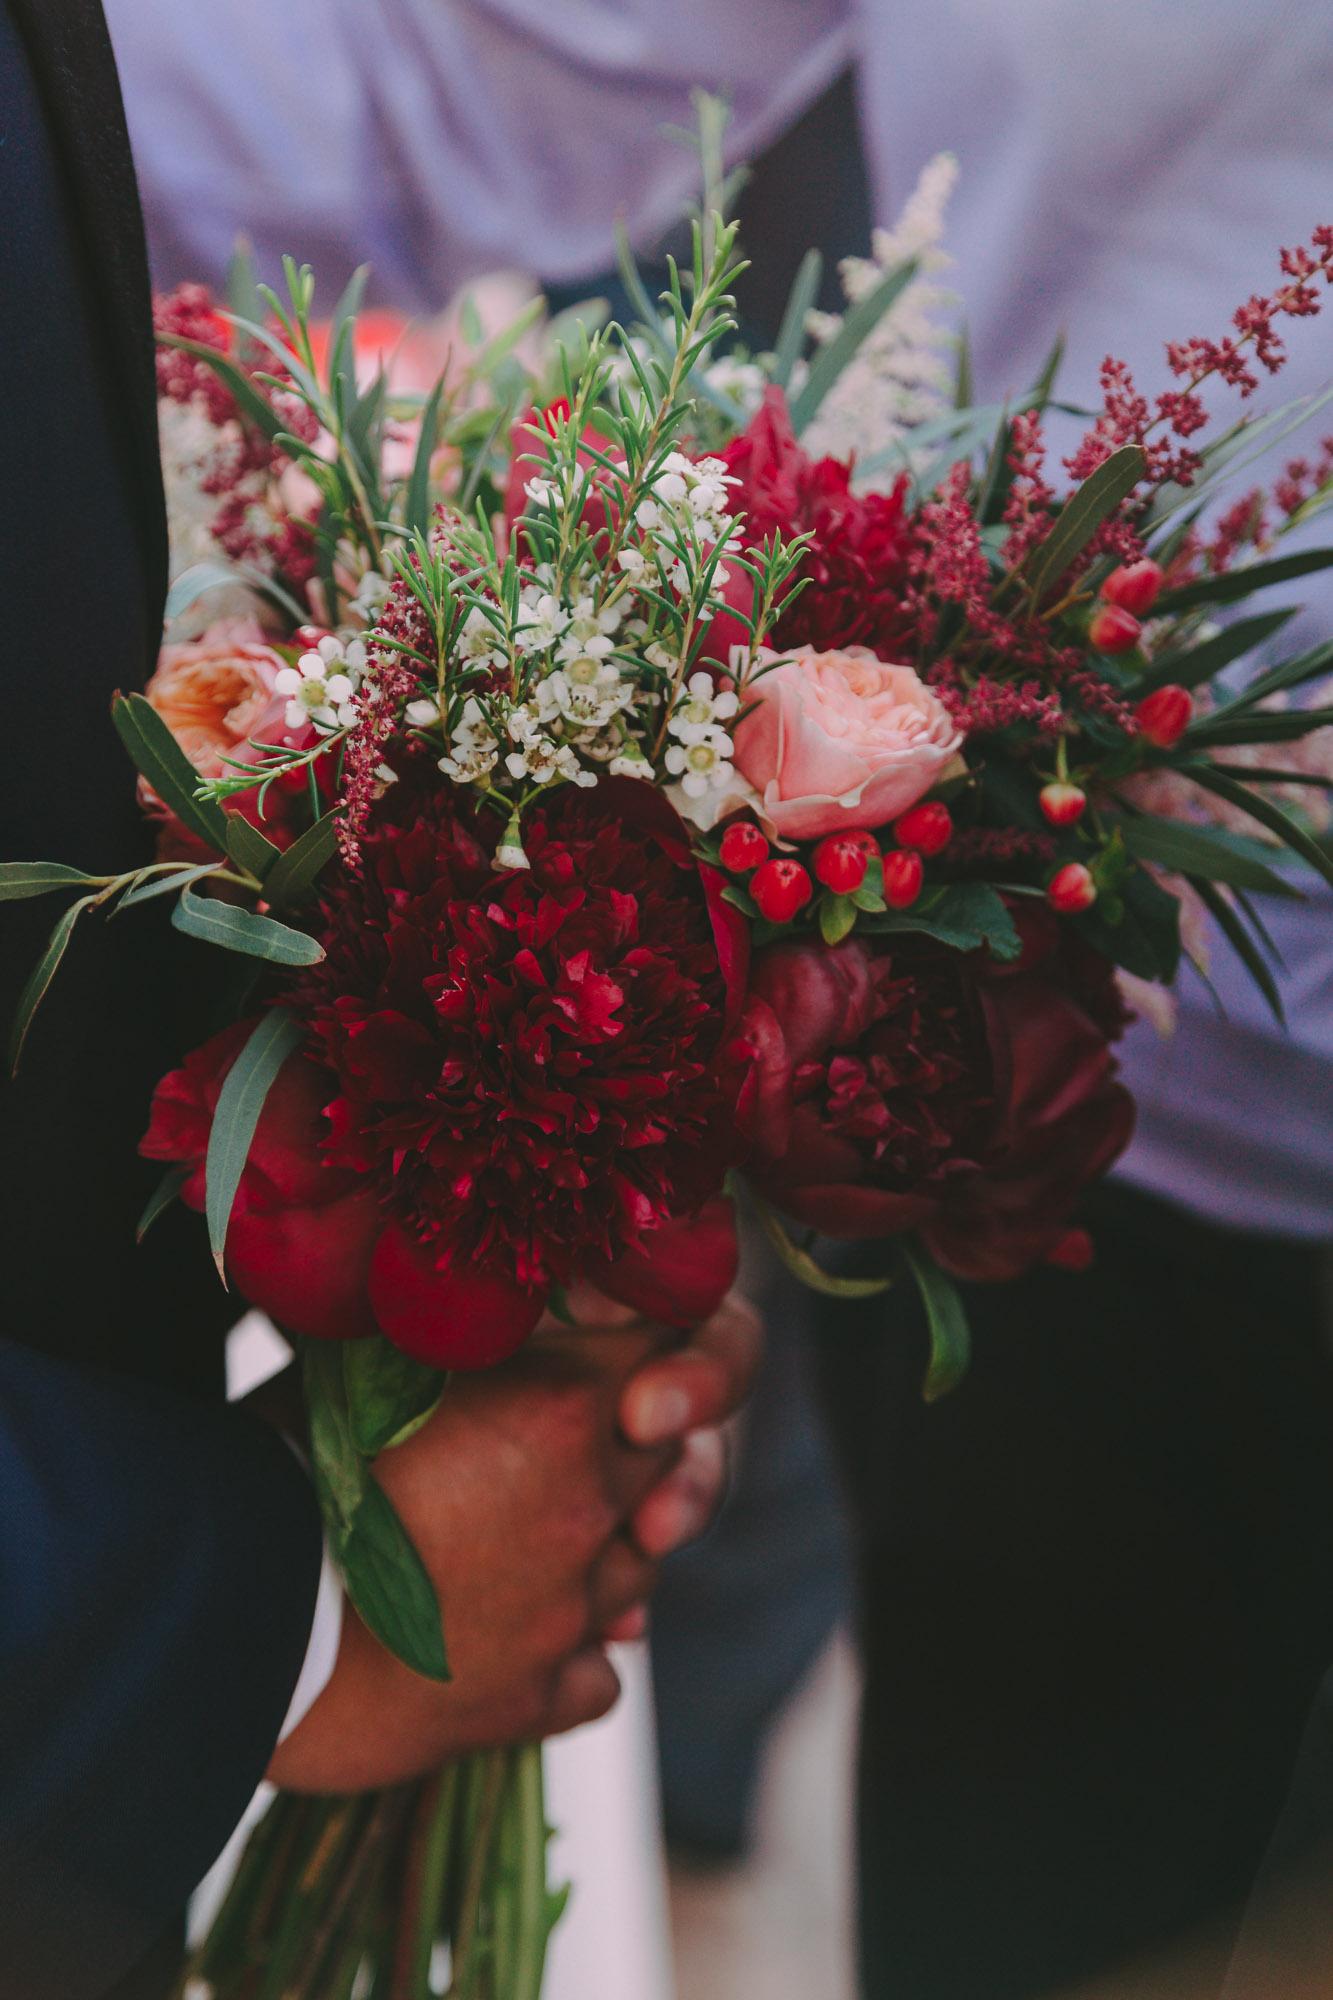 e1b09a640155 Αγαπημένες νυφικές ανθοδέσμες με τριαντάφυλλα